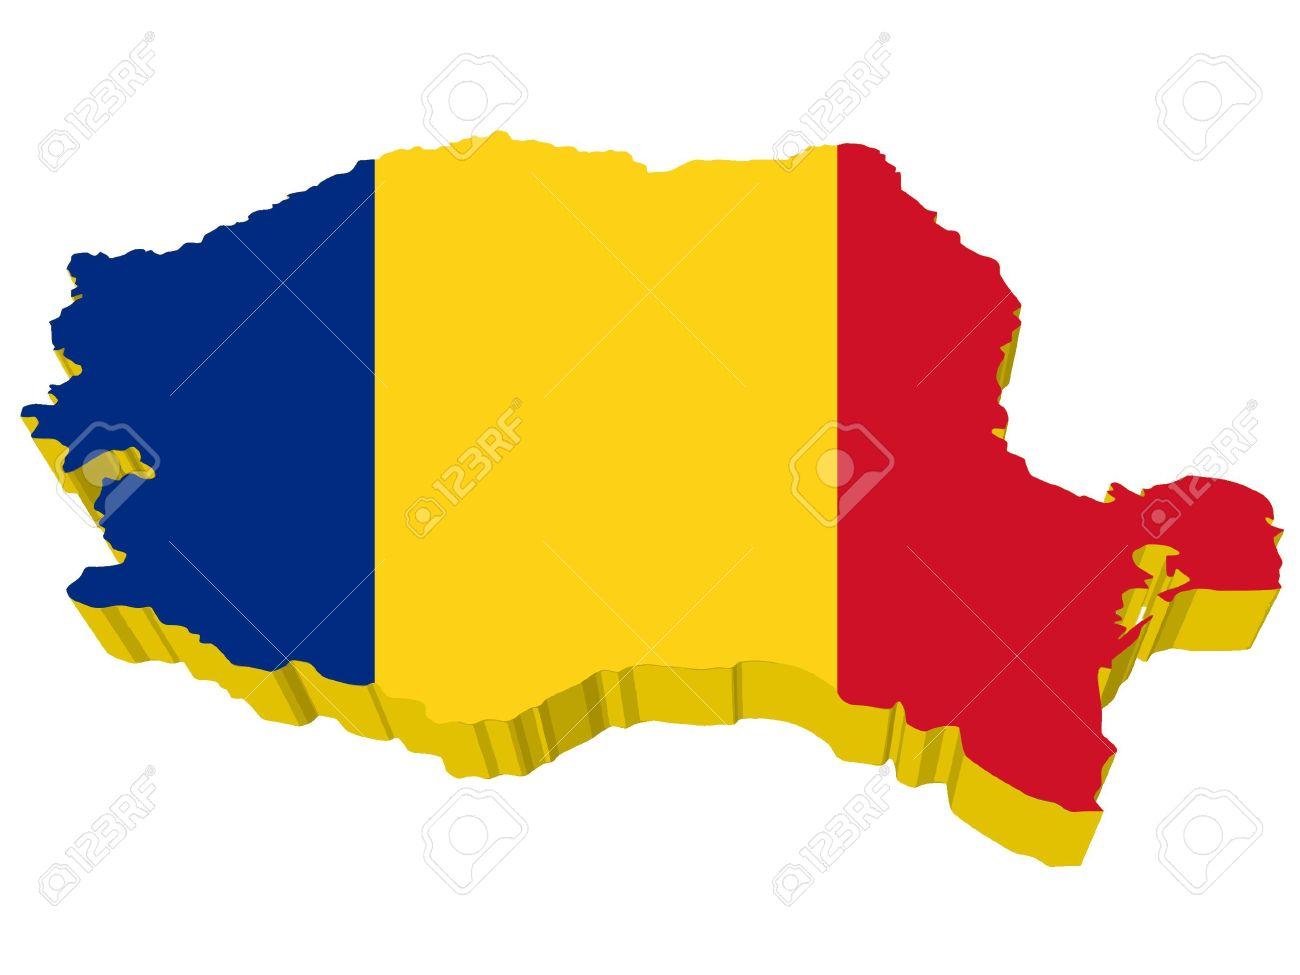 Romania - Partner